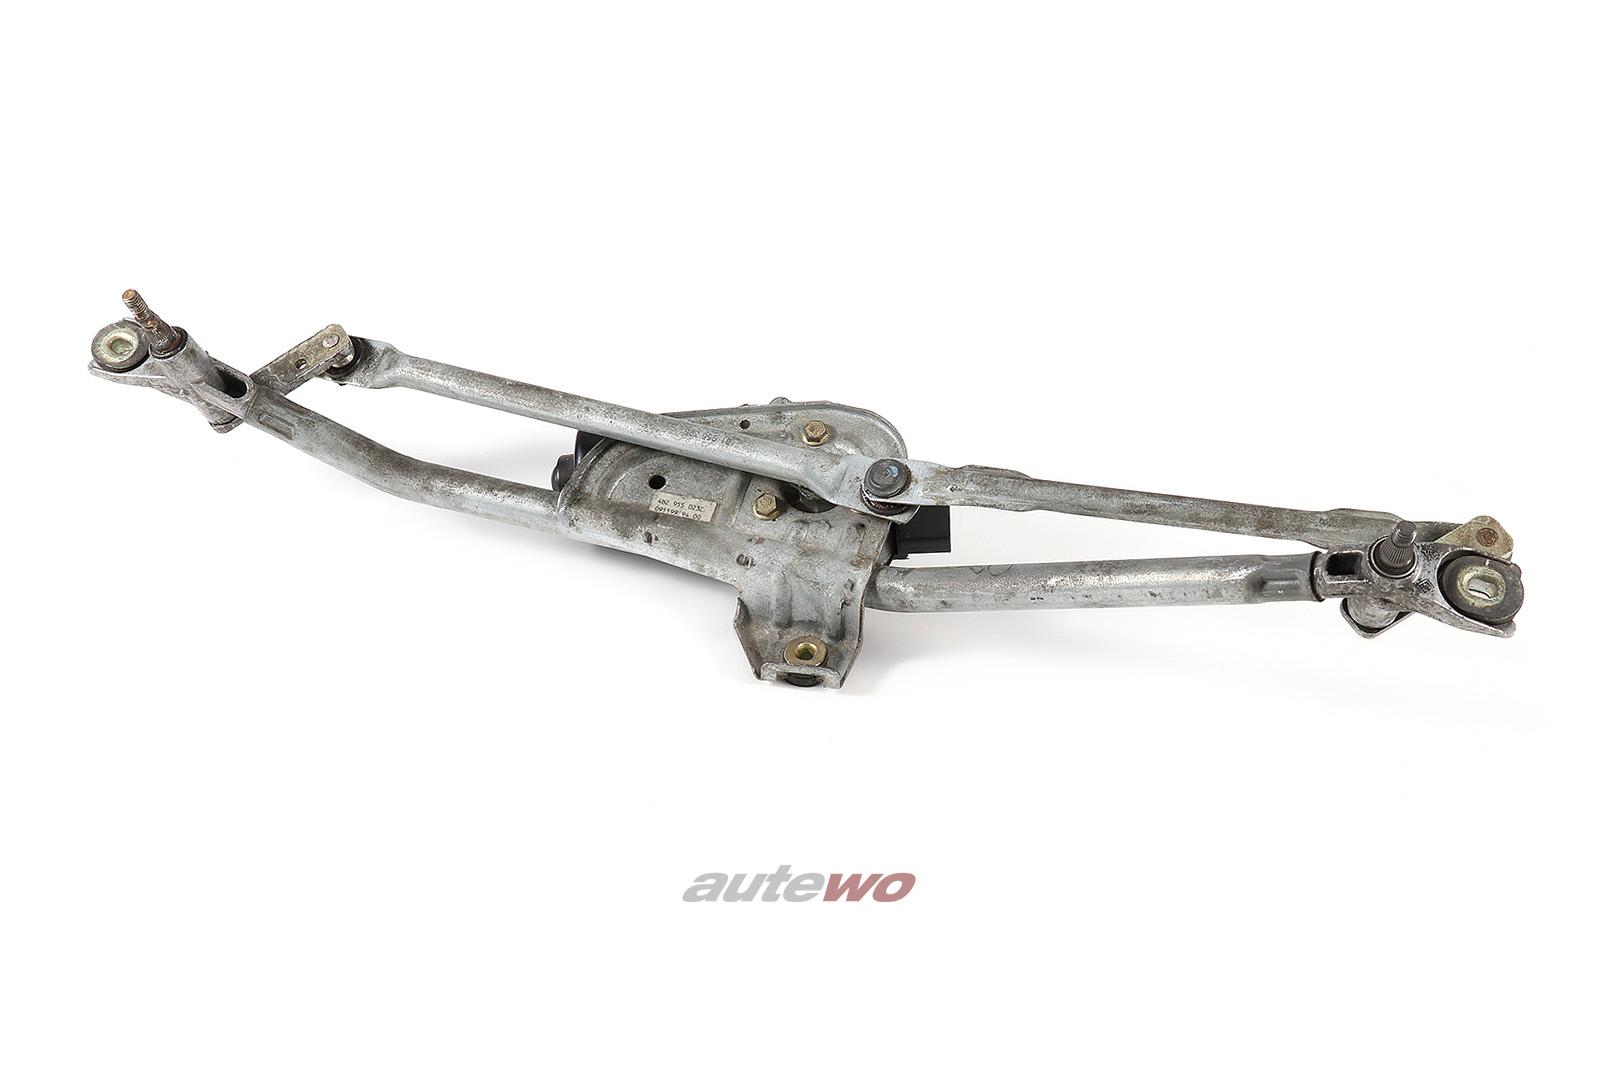 4B2955113A/4B2955603A Audi A6/S6/RS6 4B Scheibenwischer Rechtslenker Vorne